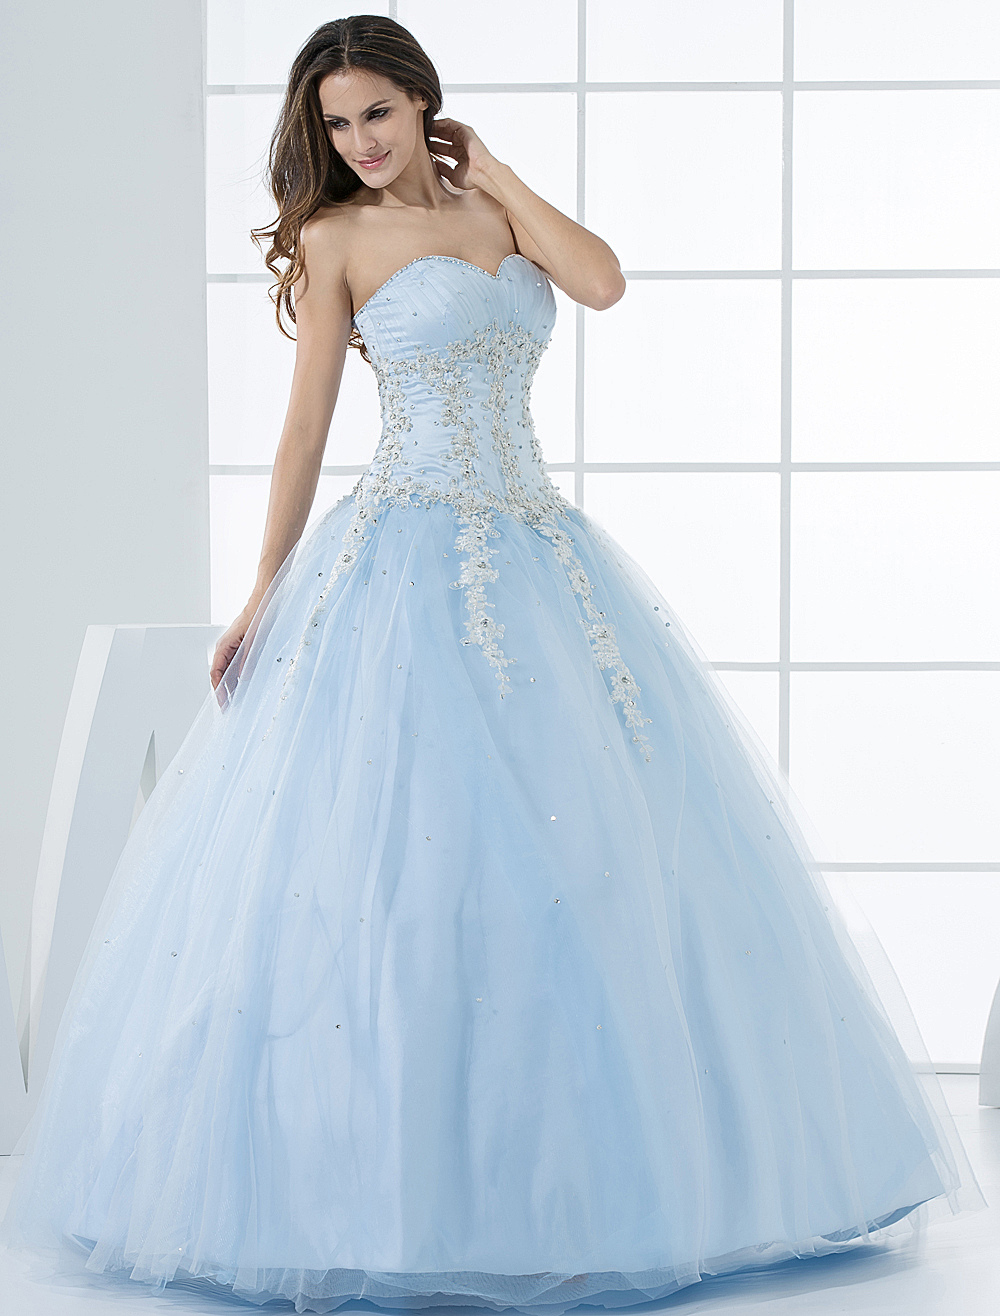 Princess Wedding Dress Pastel Blue Lace Applique Sweetheart ...